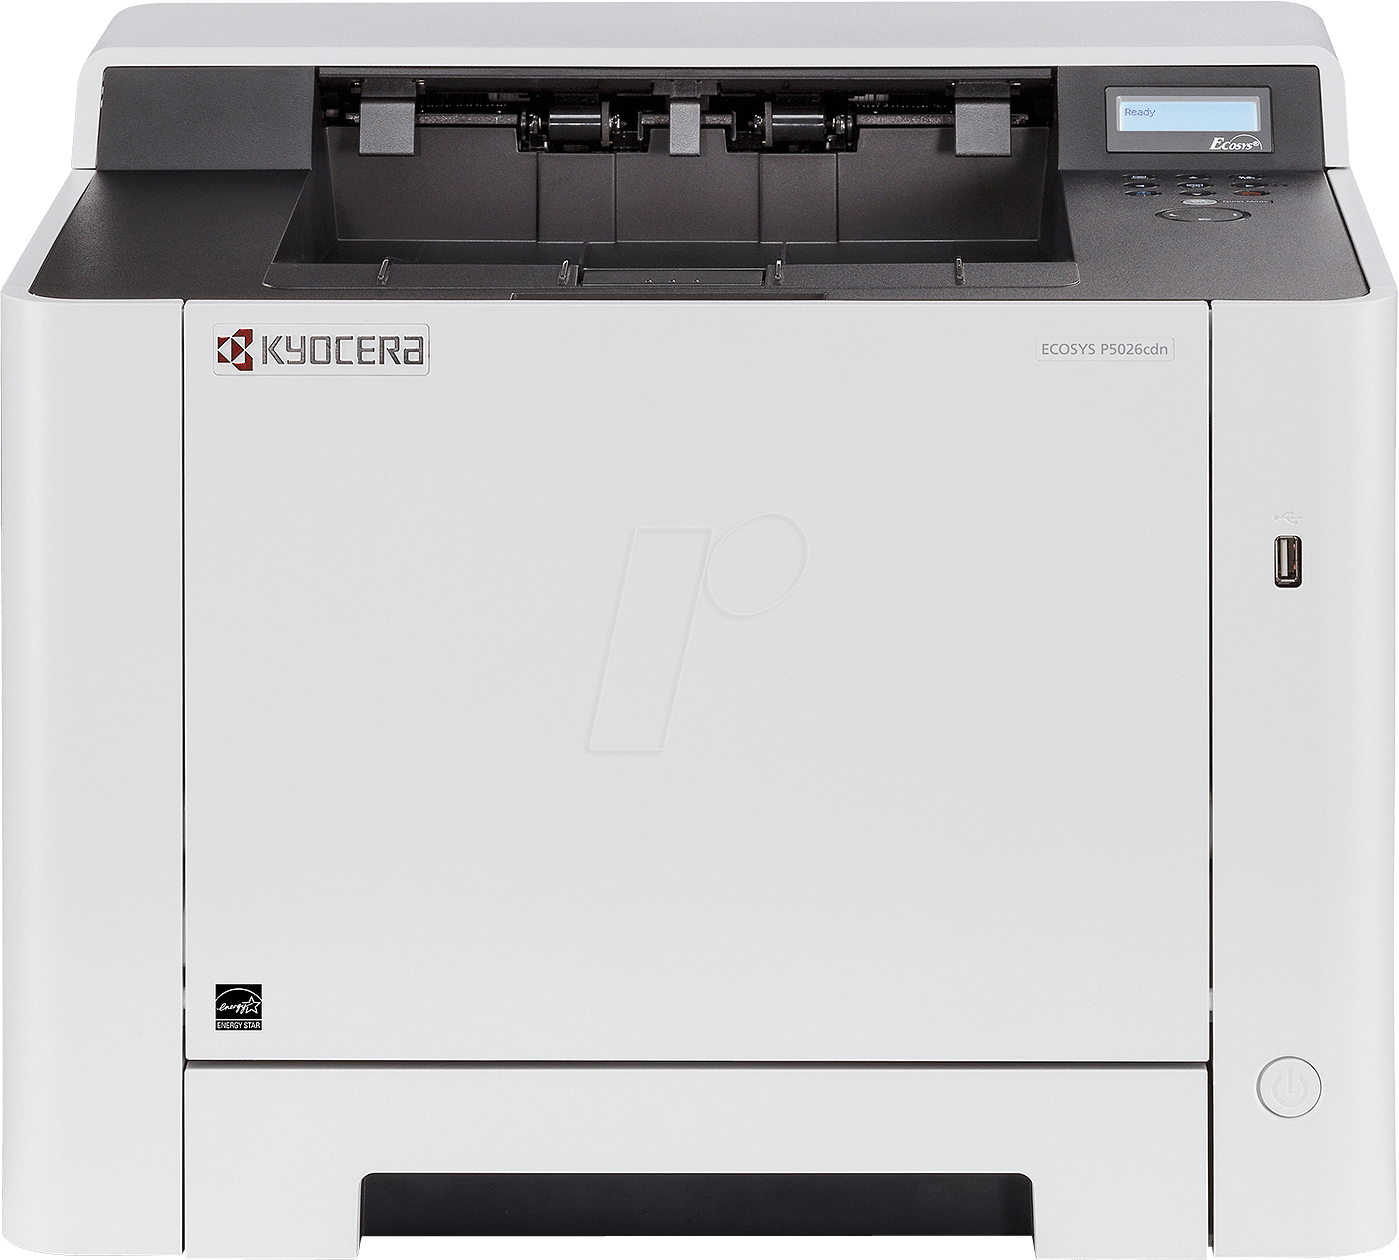 Kyocera ECOSYS P5026CDN Laserdrucker, Color, LAN, 26 S min, Duplex, inkl. UHG